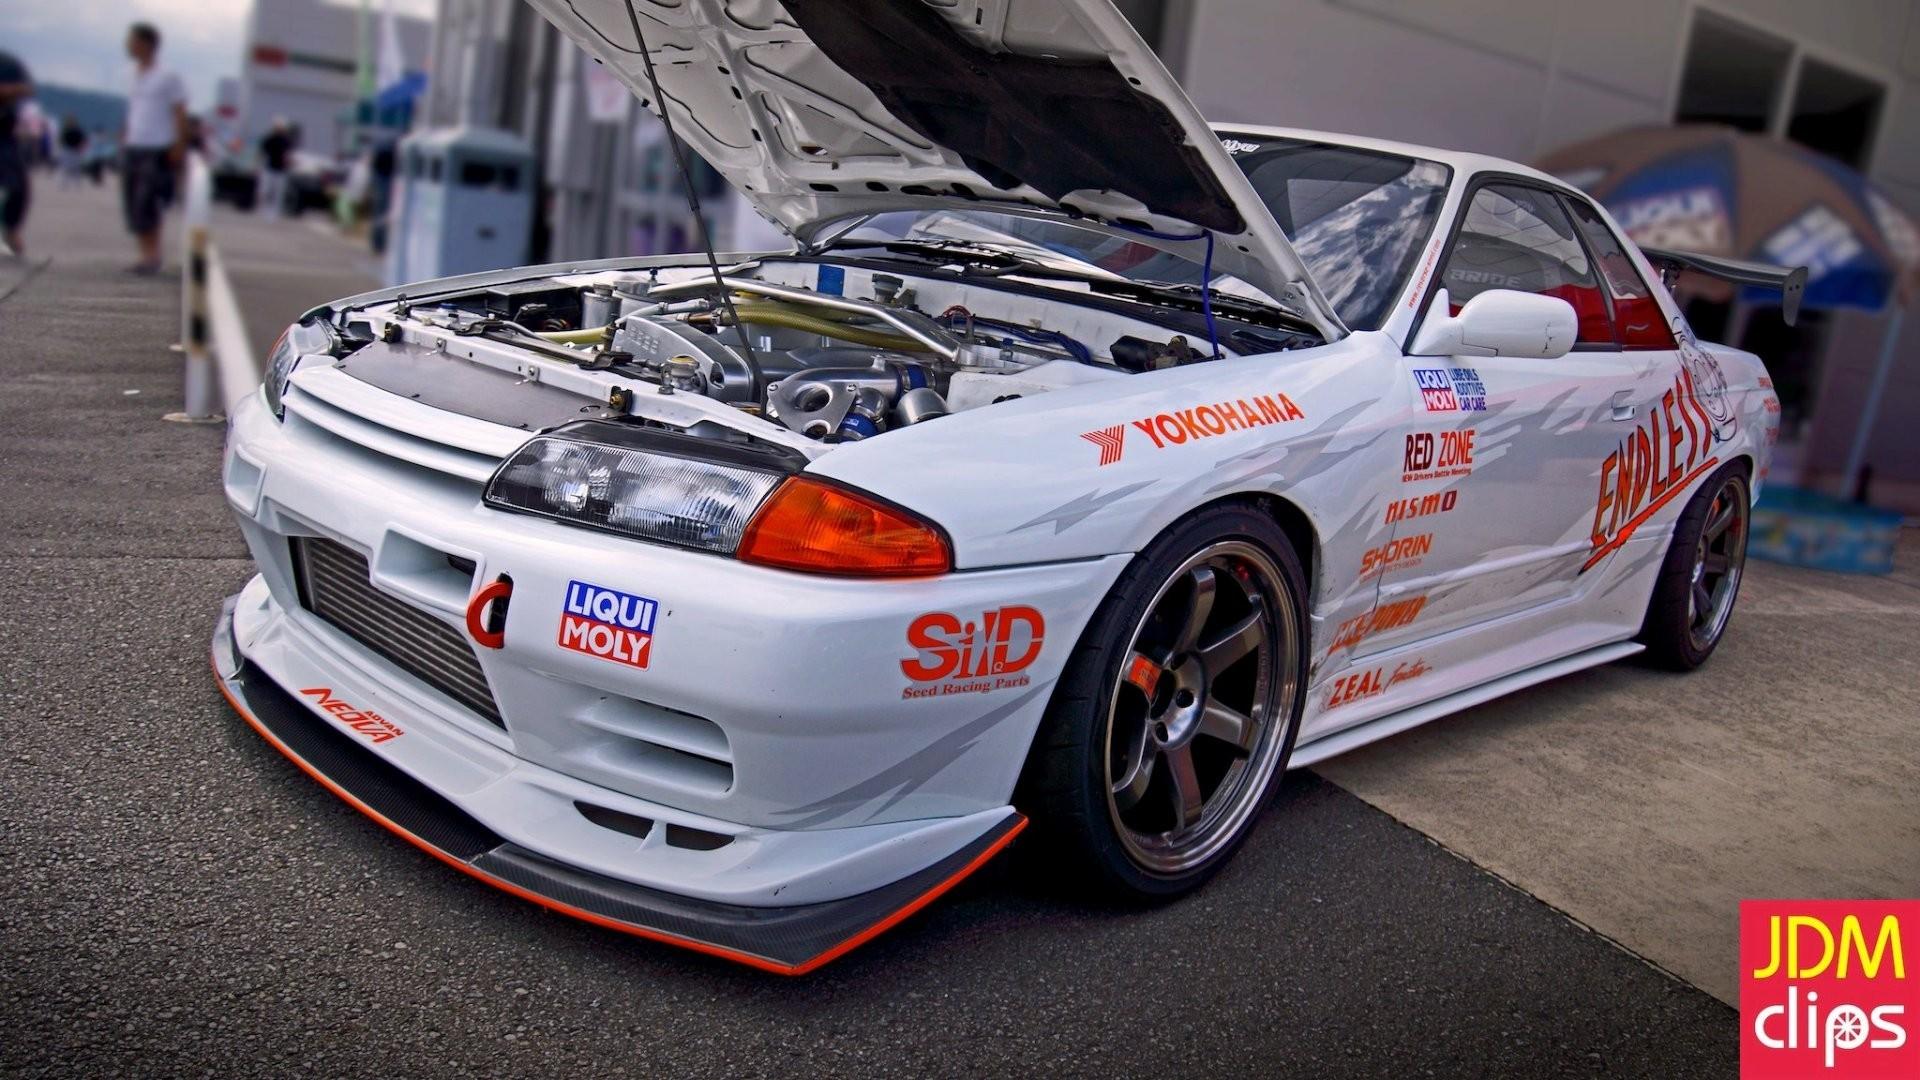 Nissan Skyline GT R R 32, Nissan Skyline, Nissan GT R R32, Nissan .